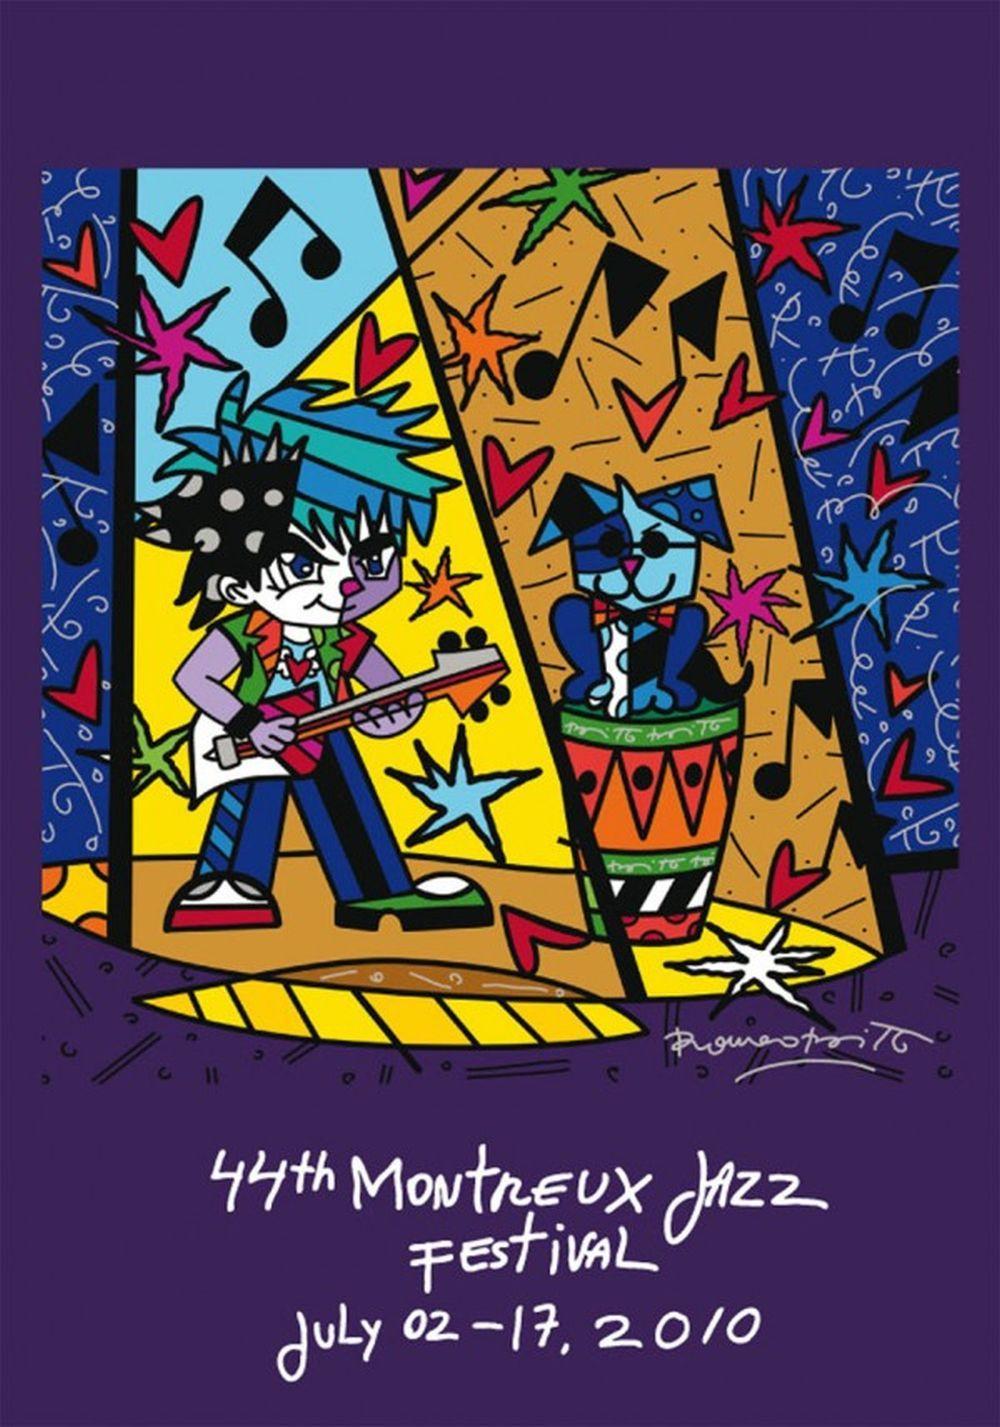 Romero Britto - Montreux Jazz 2010